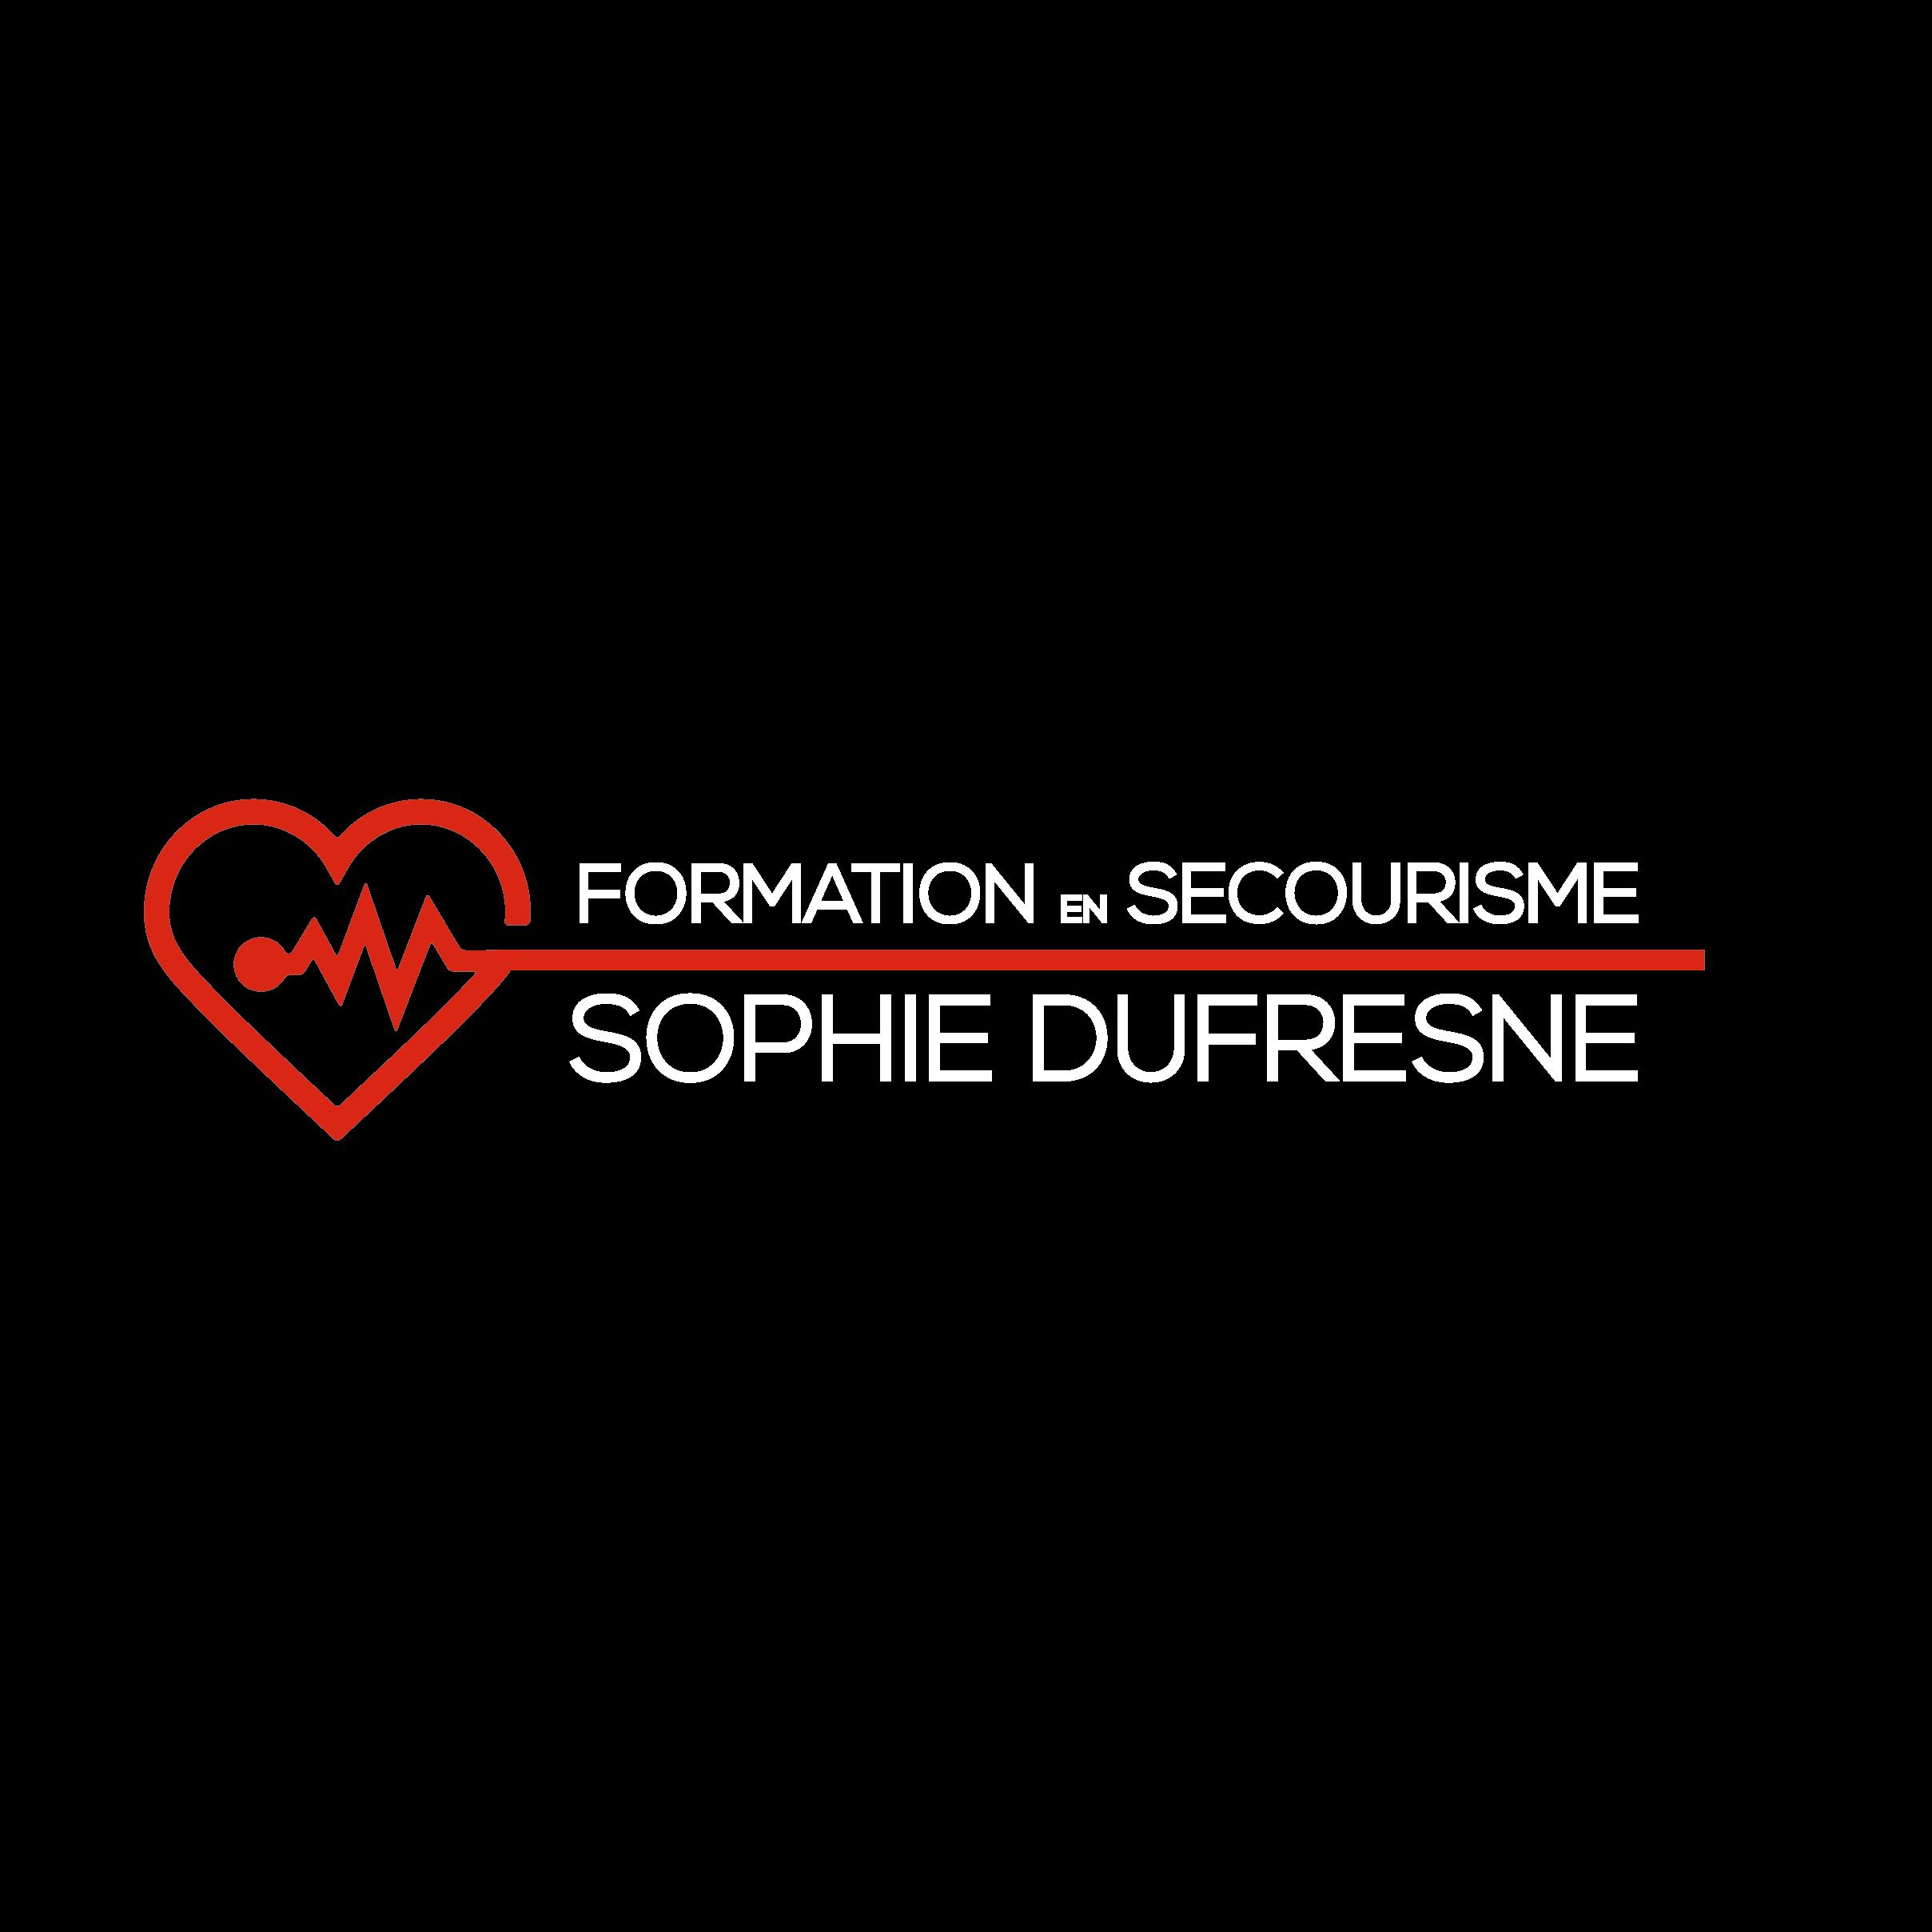 Formation en Secourisme Sophie Dufresne